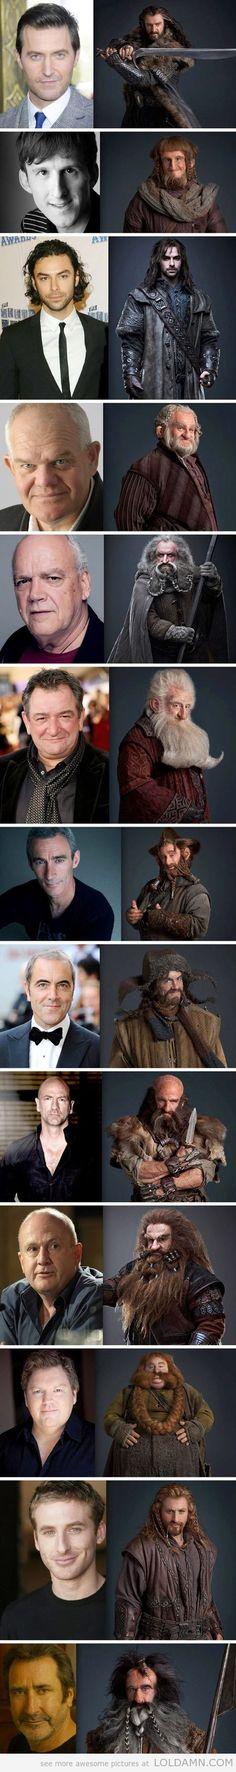 The Hobbit dwarves, pre and post make-up…